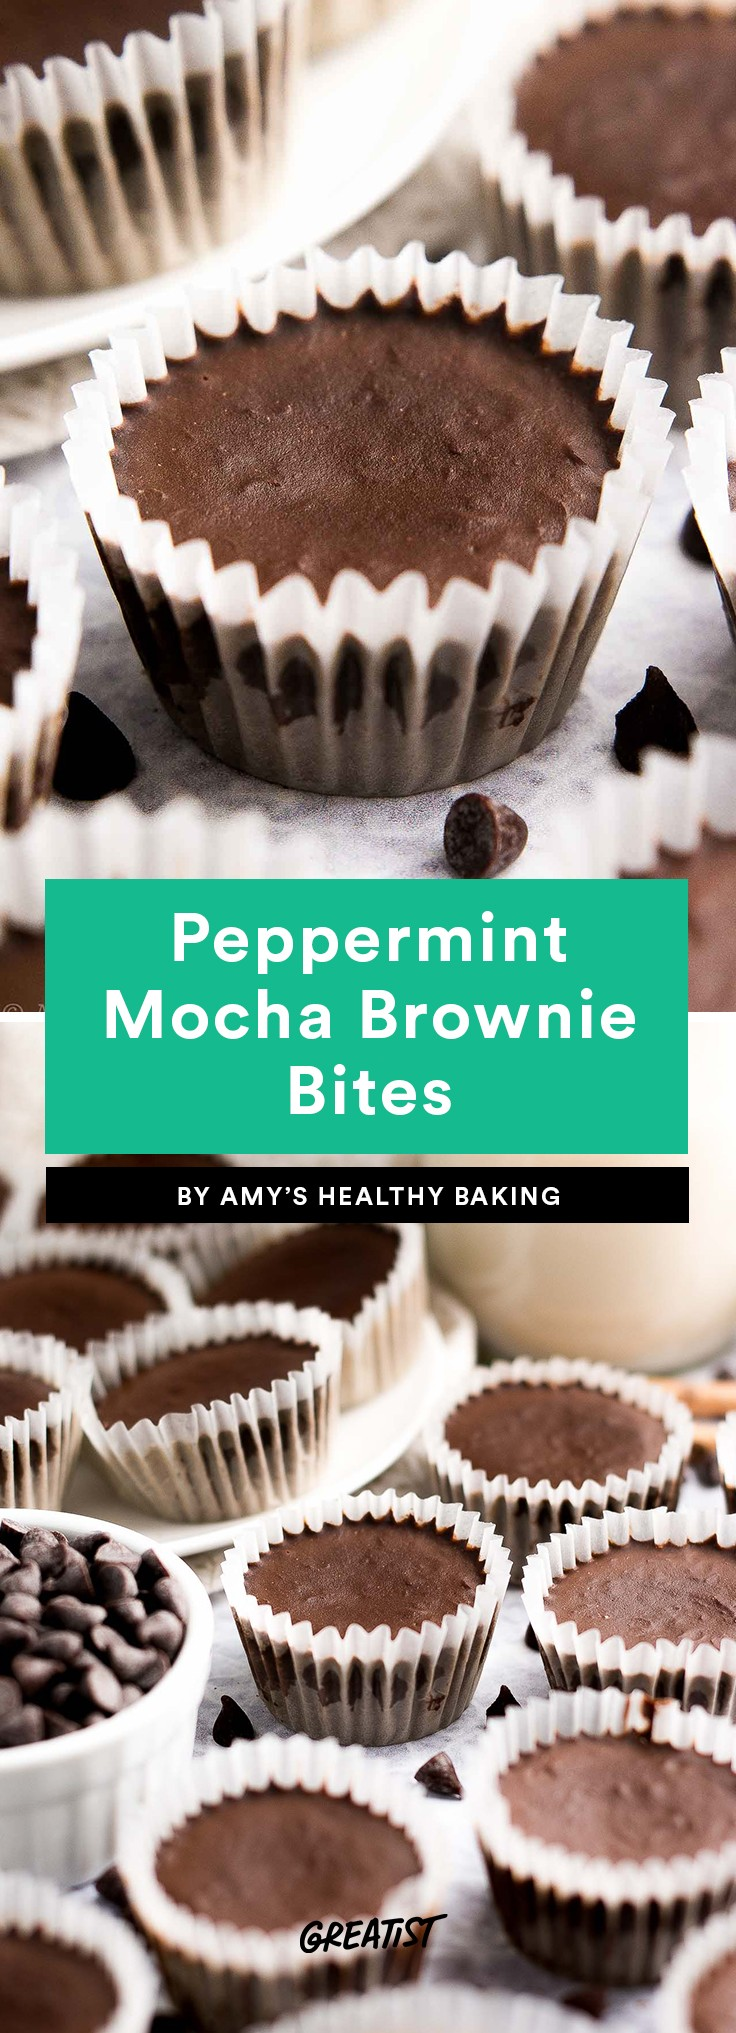 Peppermint Mocha Brownie Bites